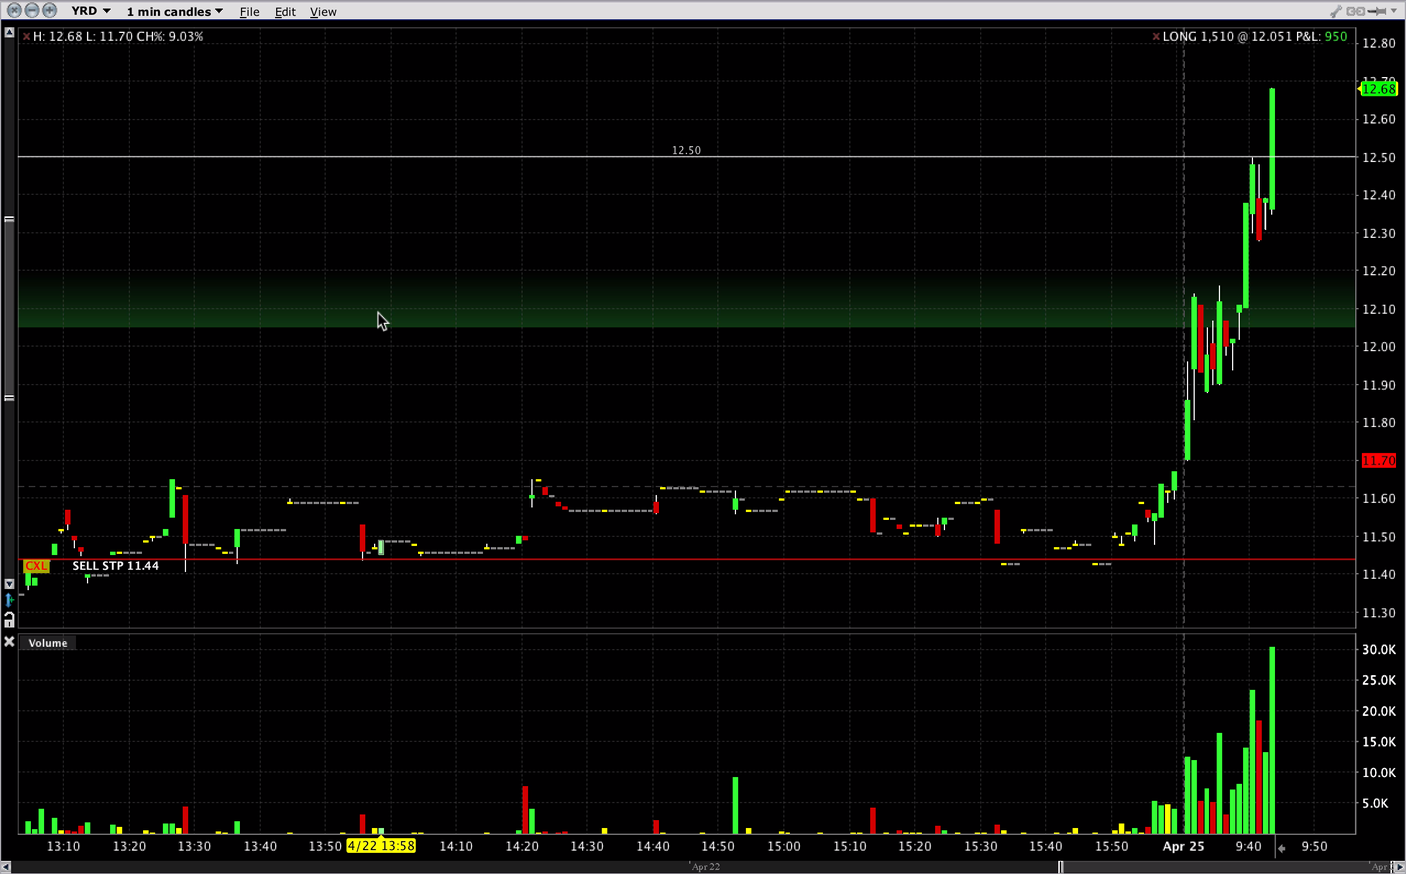 Trading En Vivo $YRD